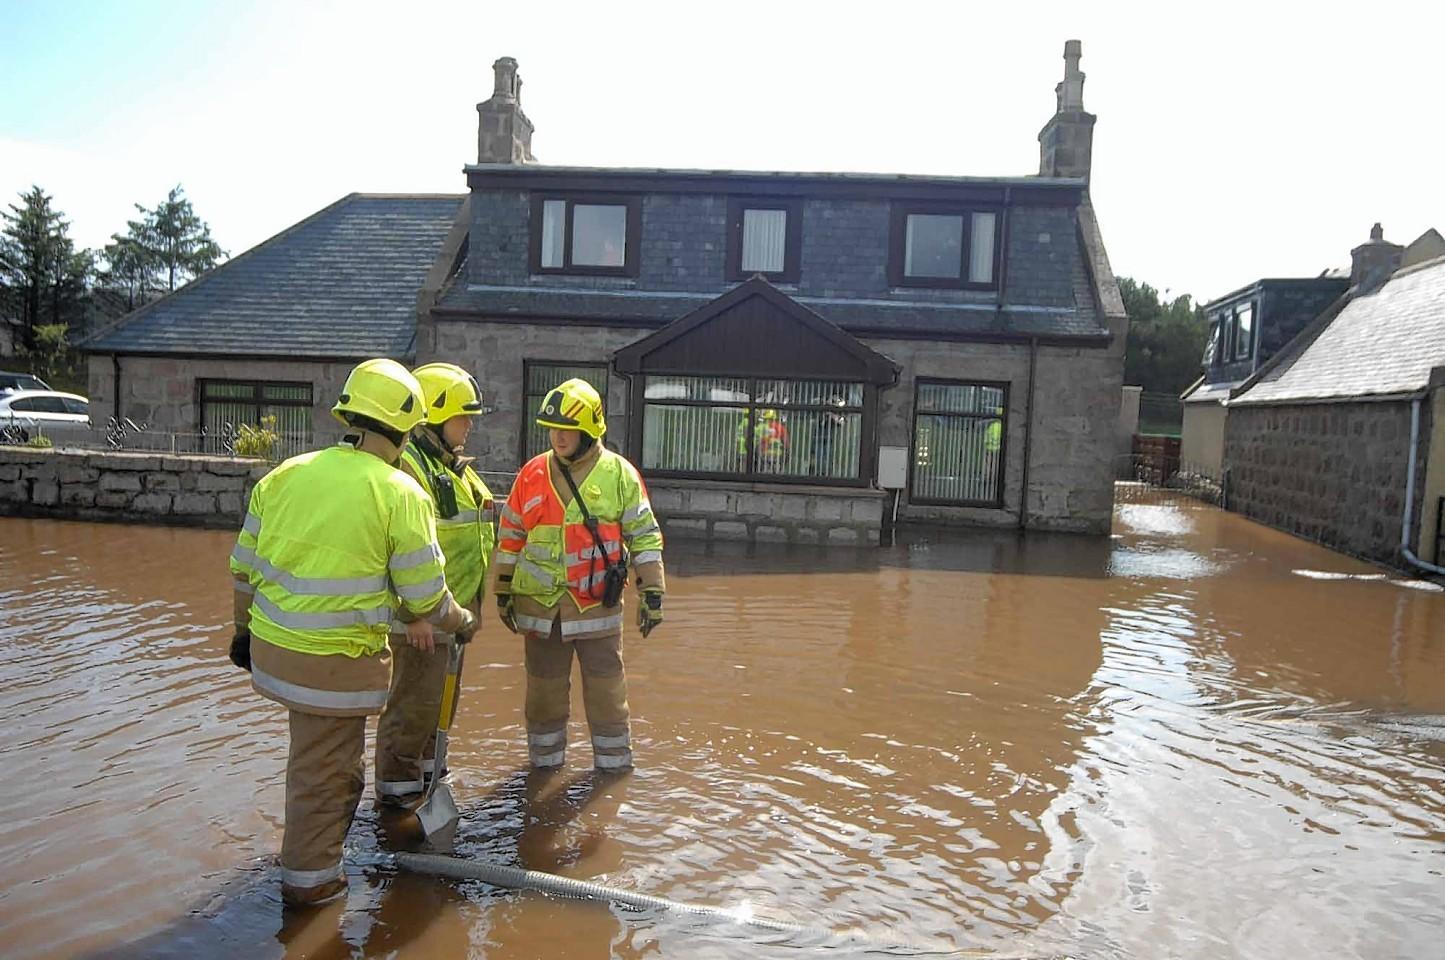 Boddam flooding